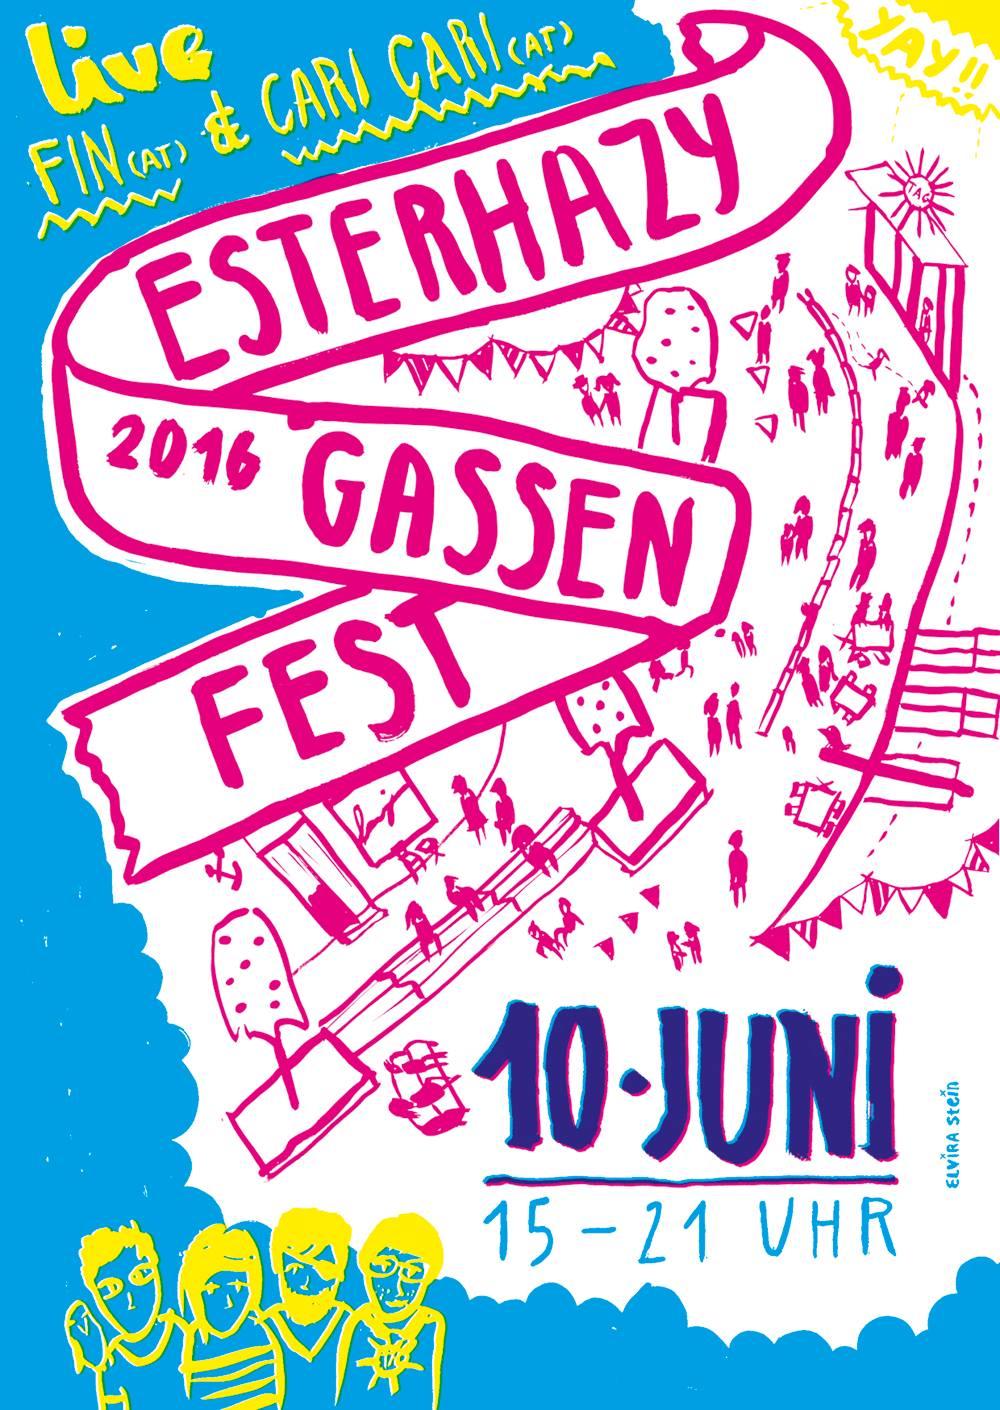 esterhazygassenfest-fin-cari-cari-2016